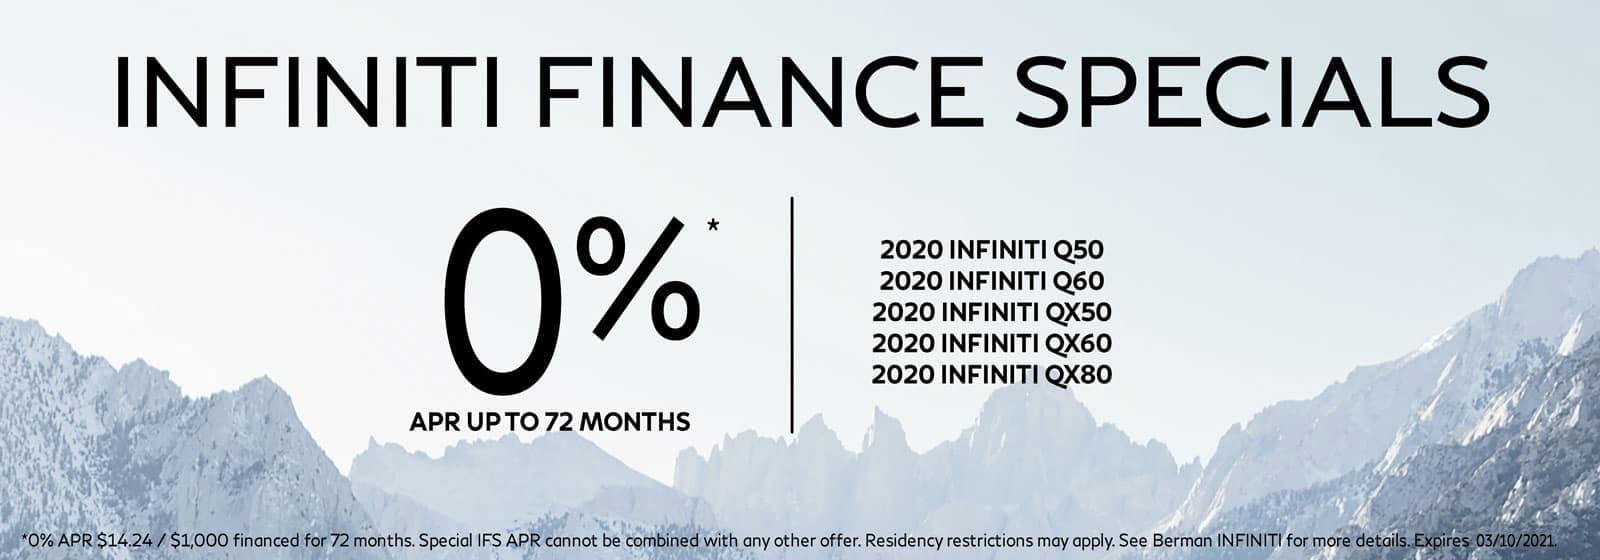 INFINITI Finance SPECIALS